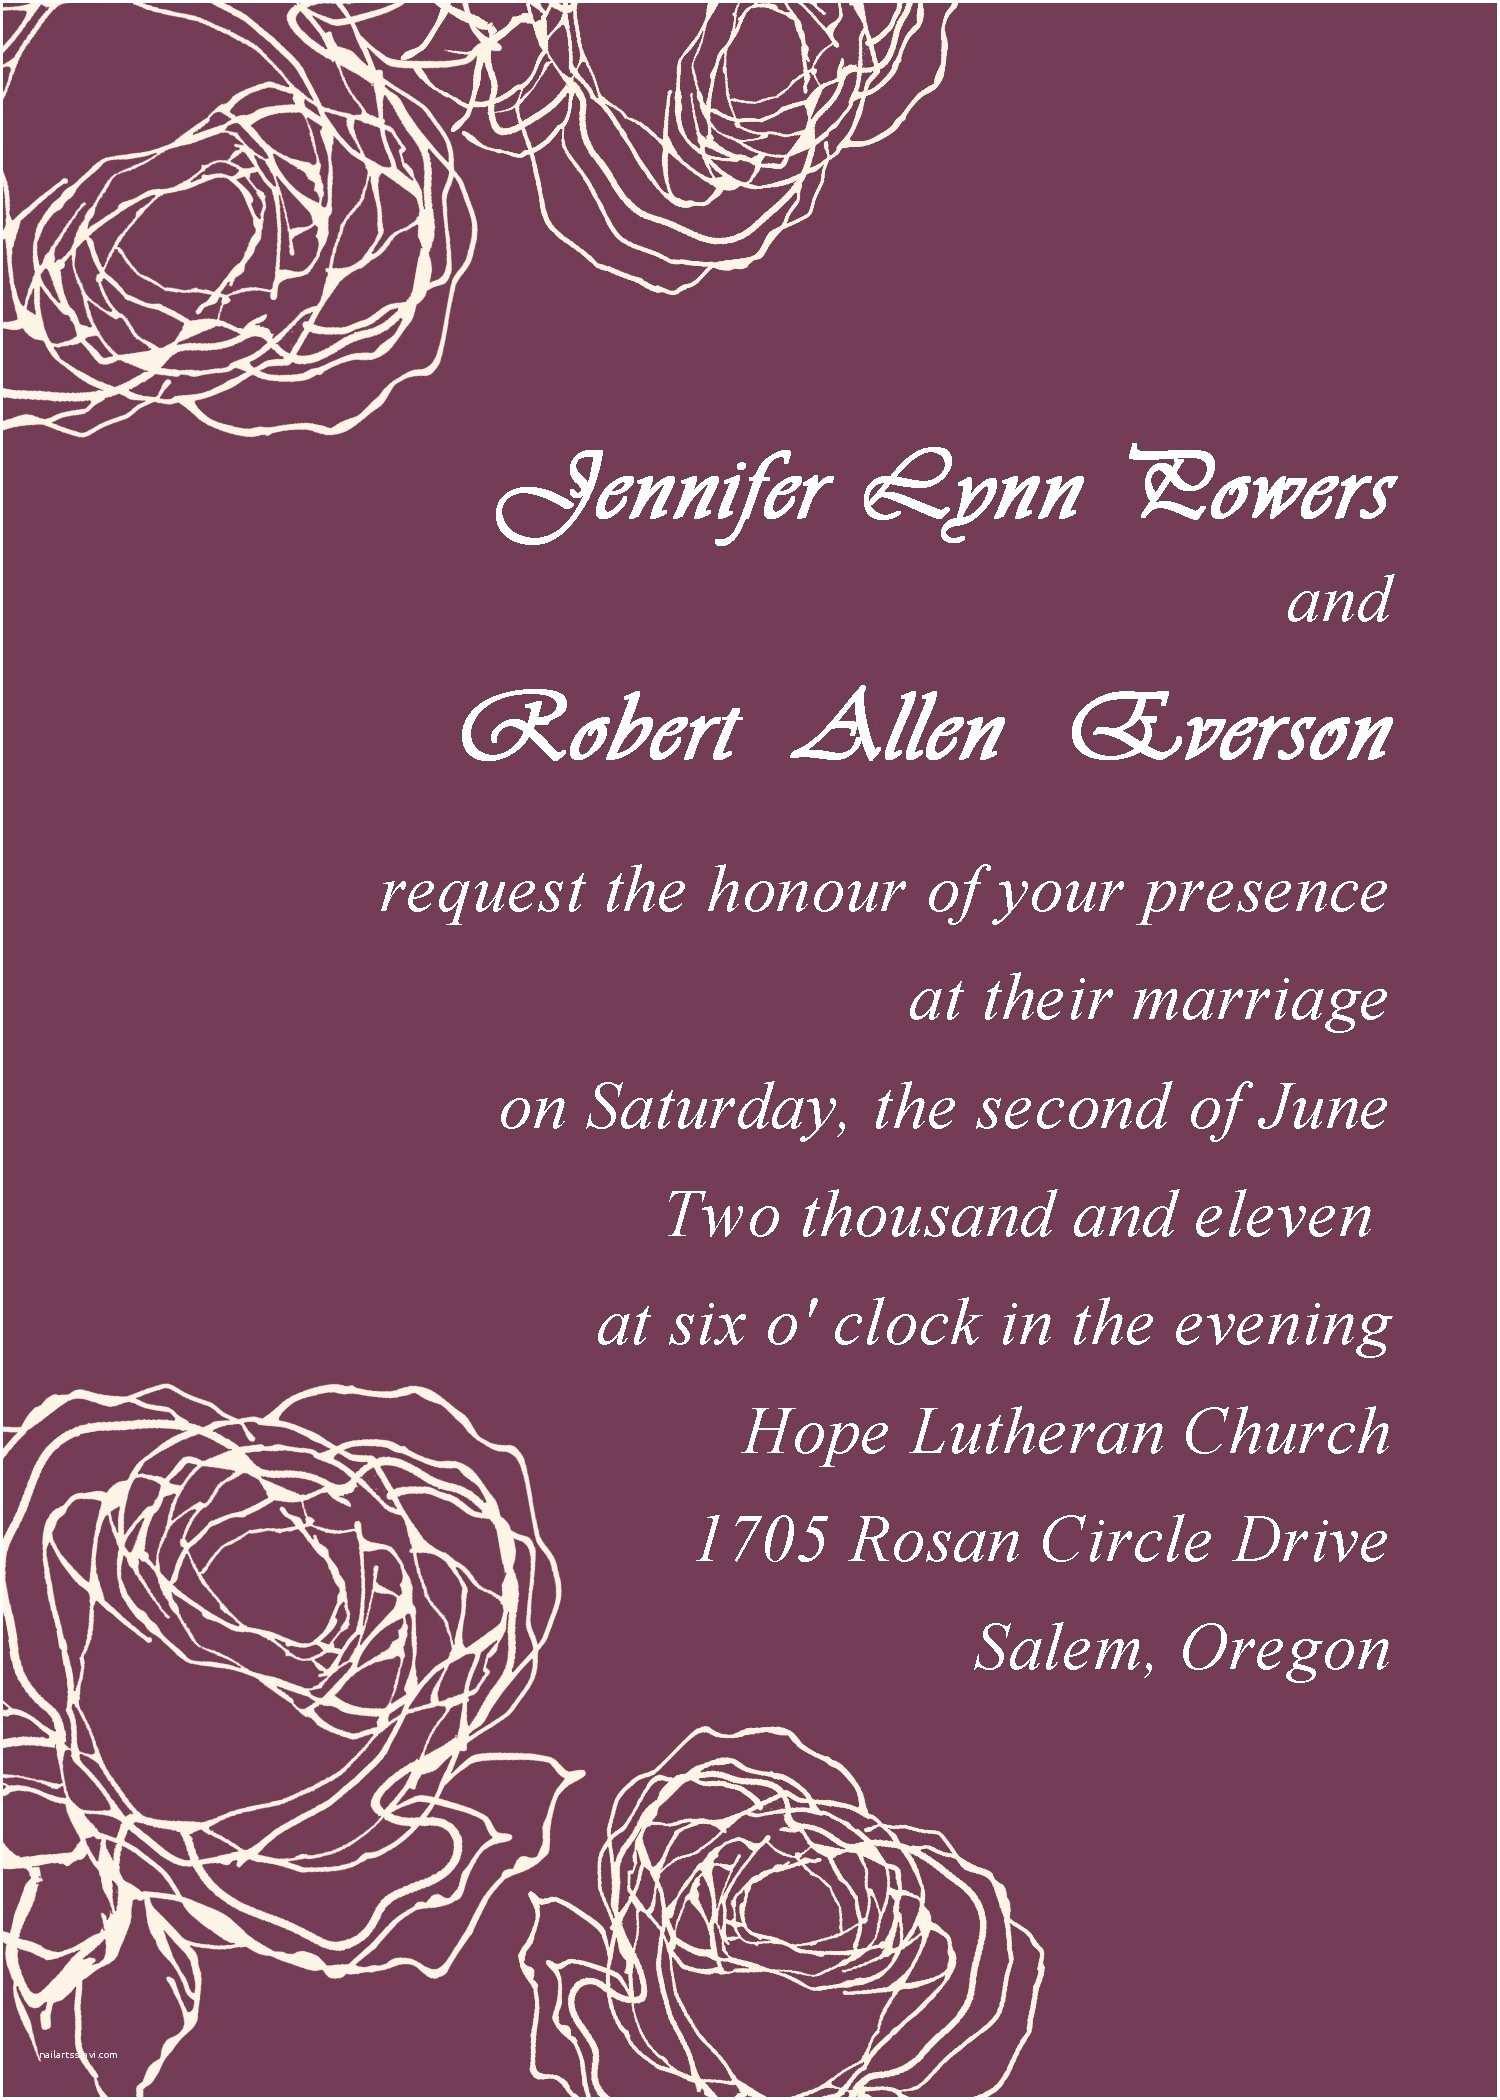 Wedding Invitation Cards Online Vintage Plum Rose Elegant Wedding Invitation Cards Online